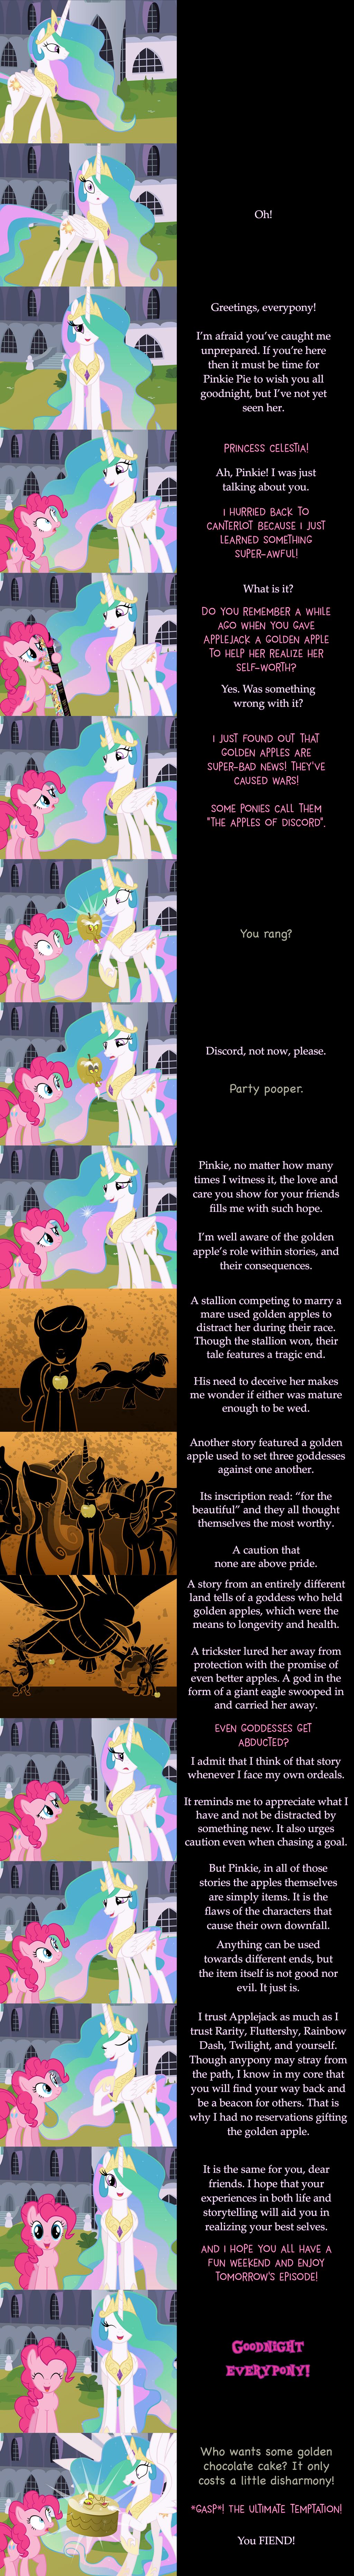 Pinkie Pie Says Goodnight: Apples of Discord